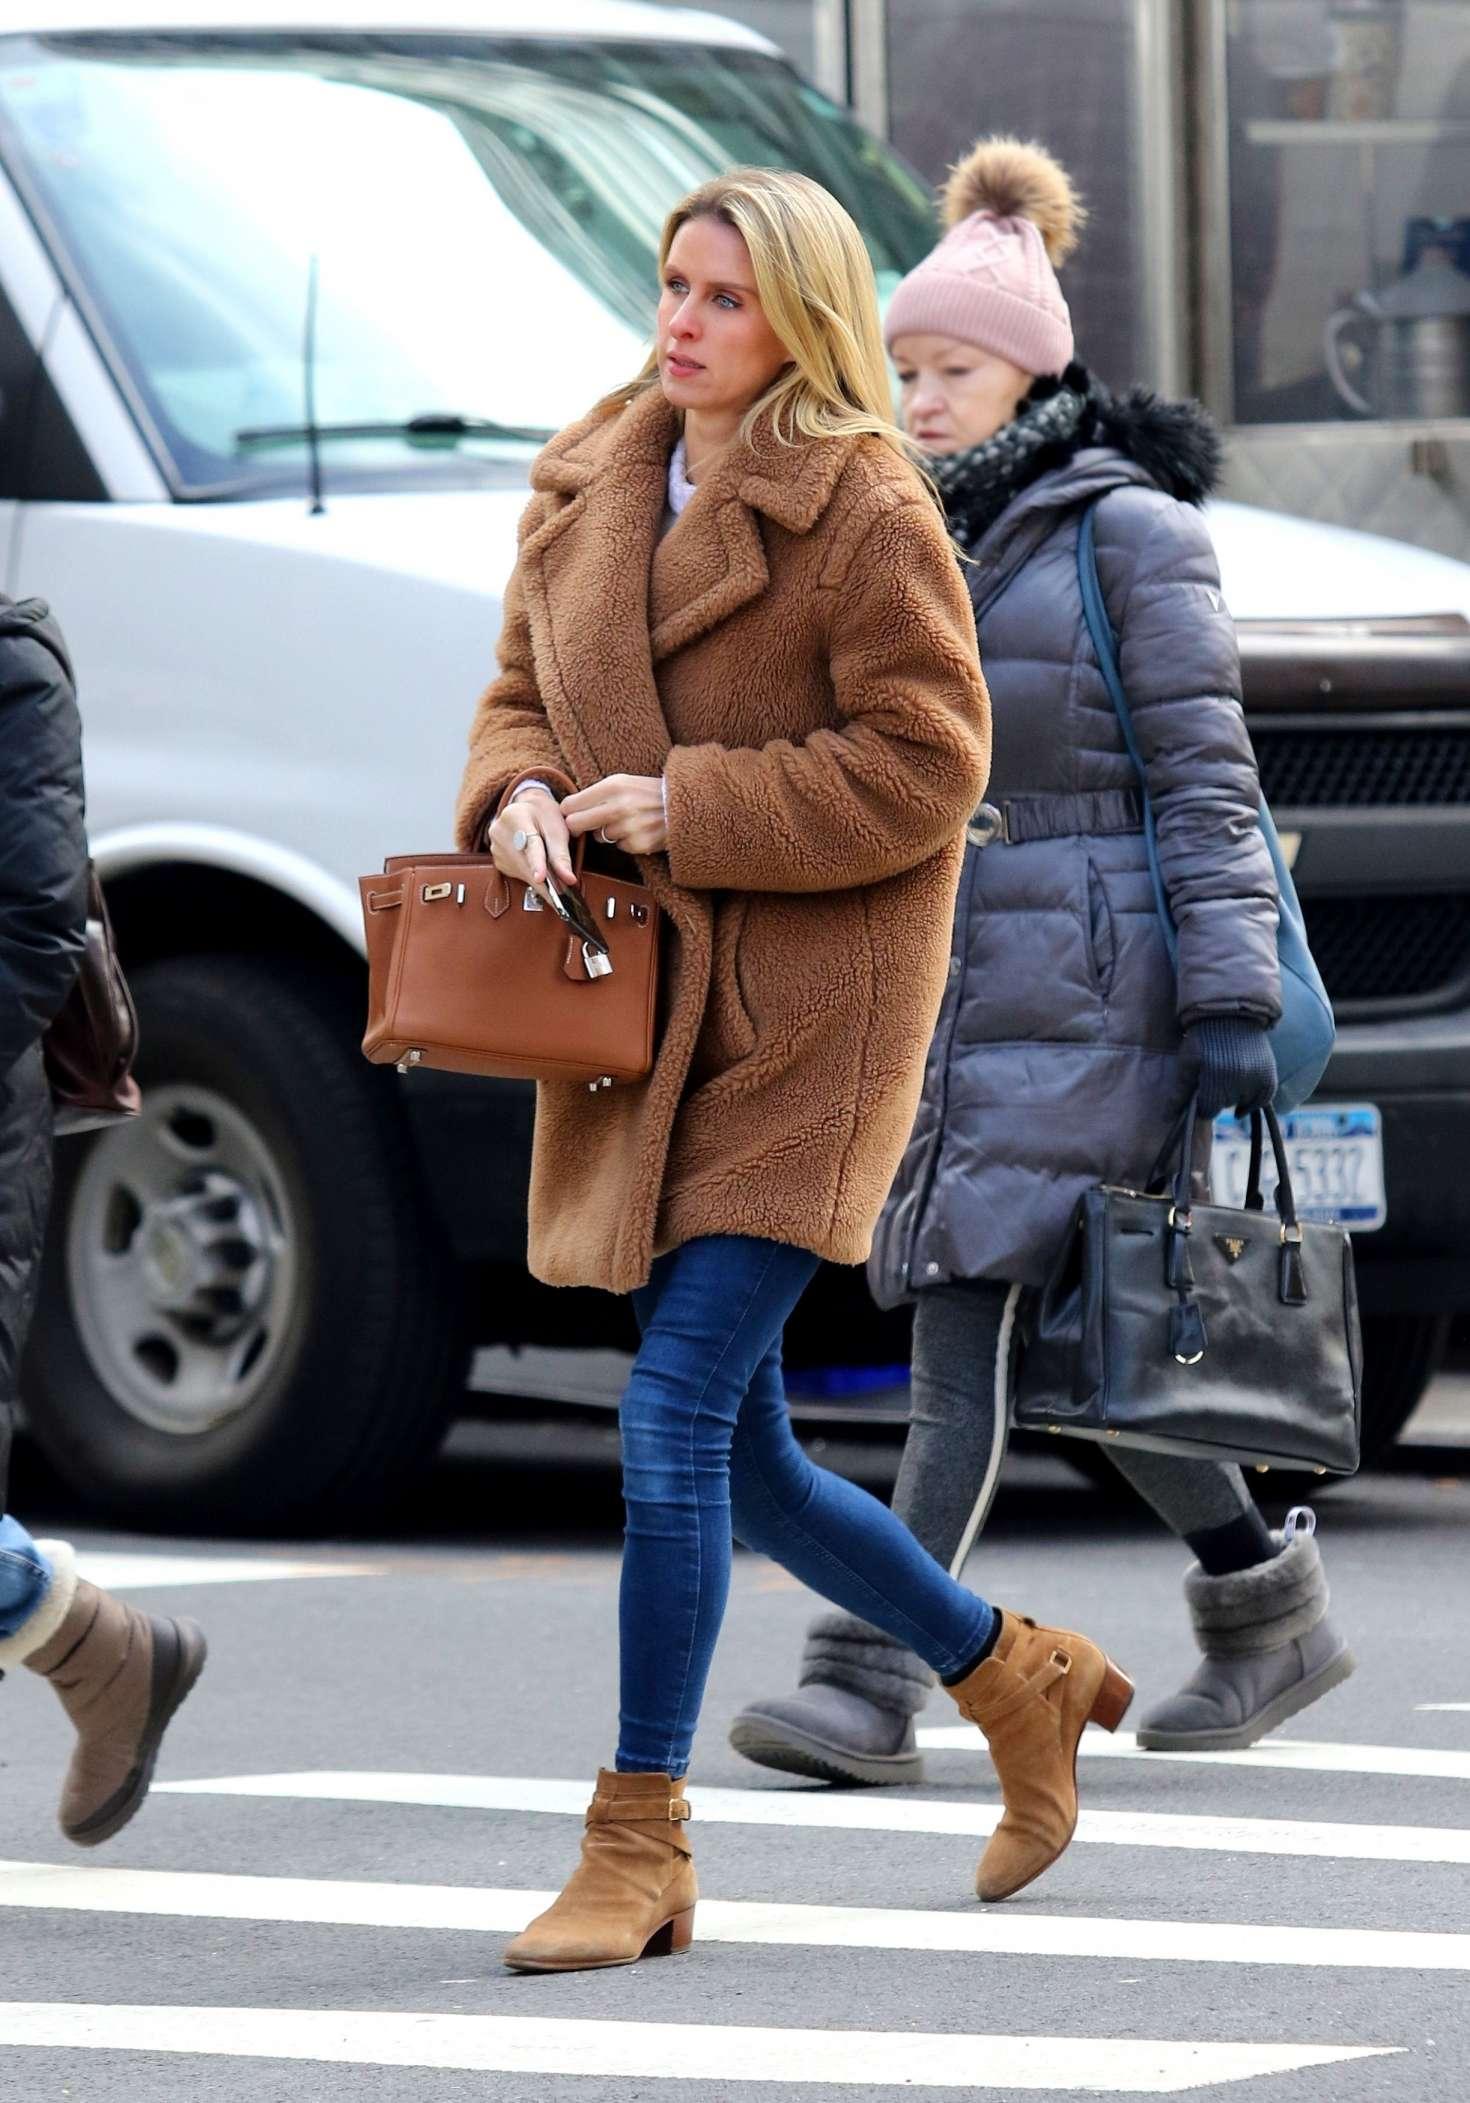 Nicky Hilton 2019 : Nicky Hilton: Riding the subway in New York -08